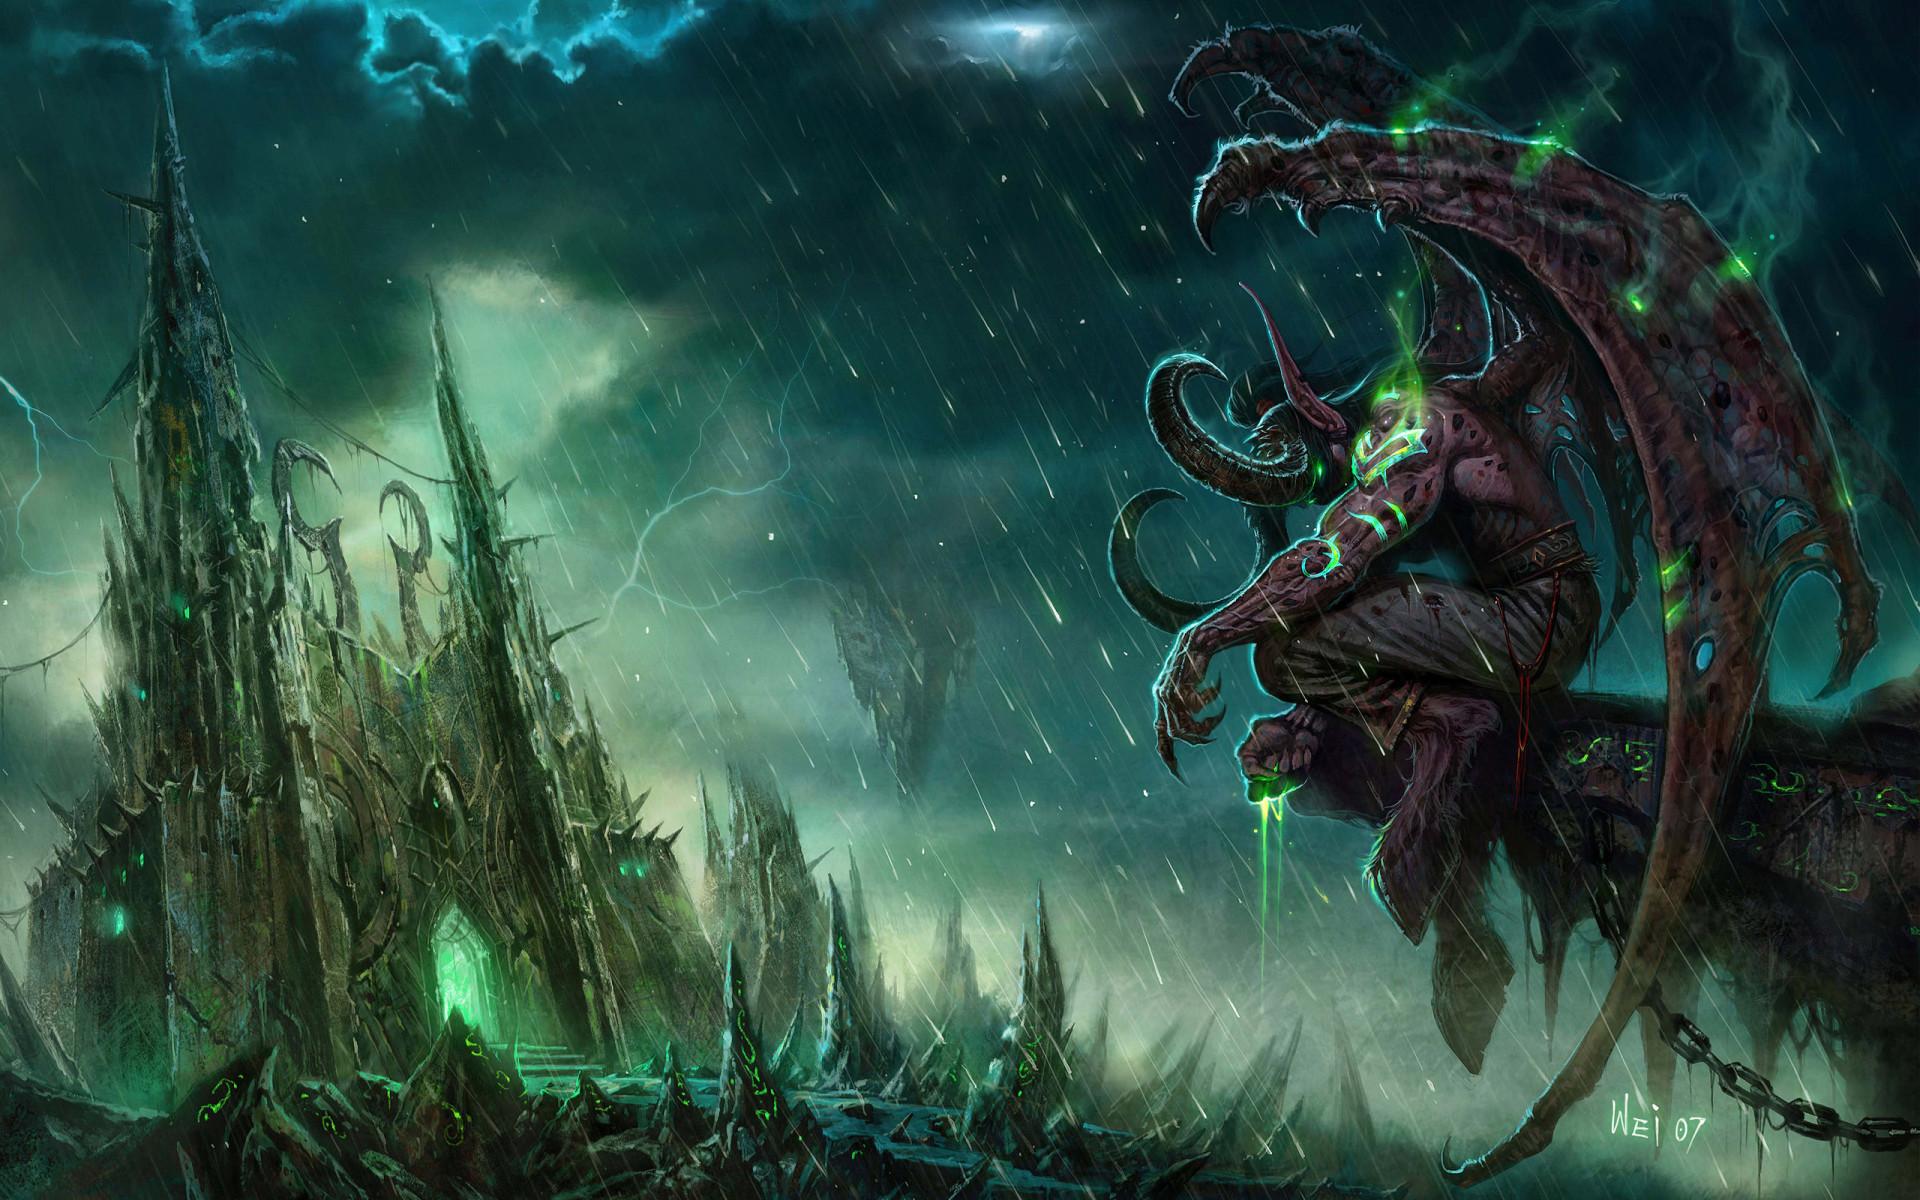 Fantasy Wallpaper Image Picture Dekstop